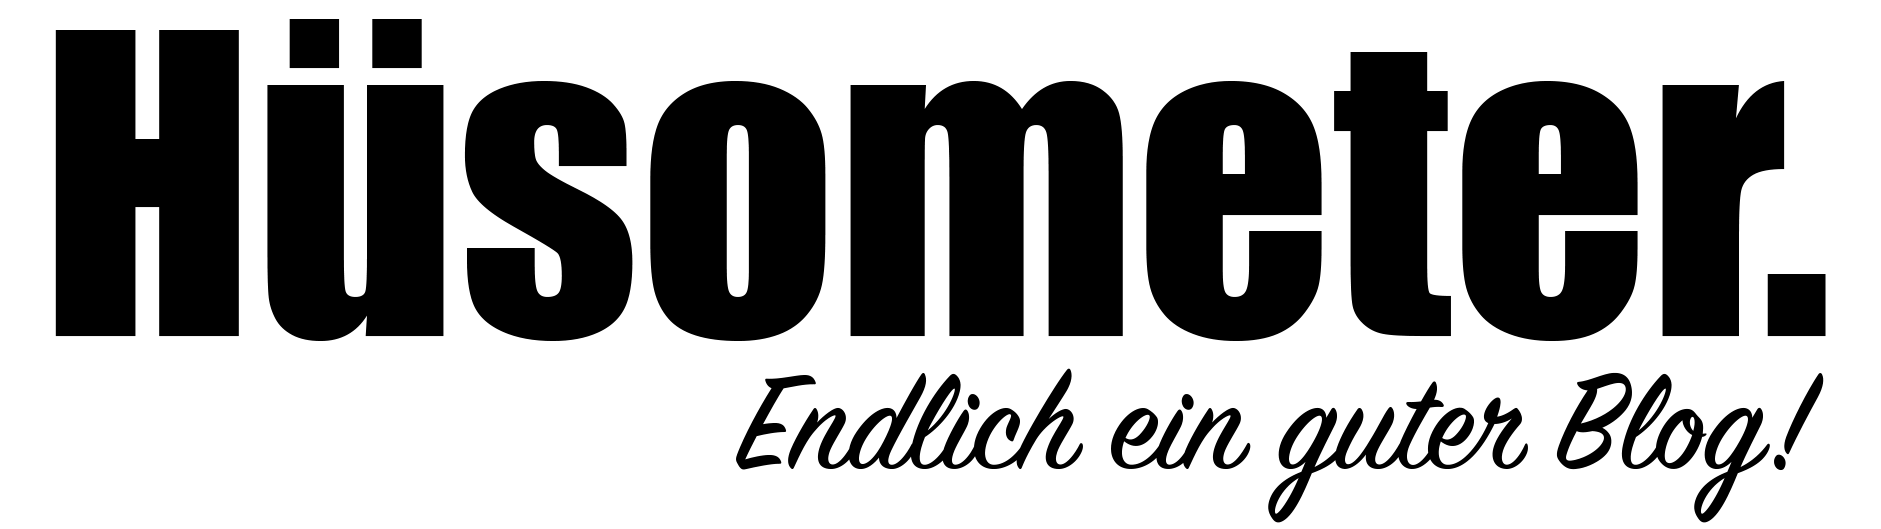 Hüsometer Blog